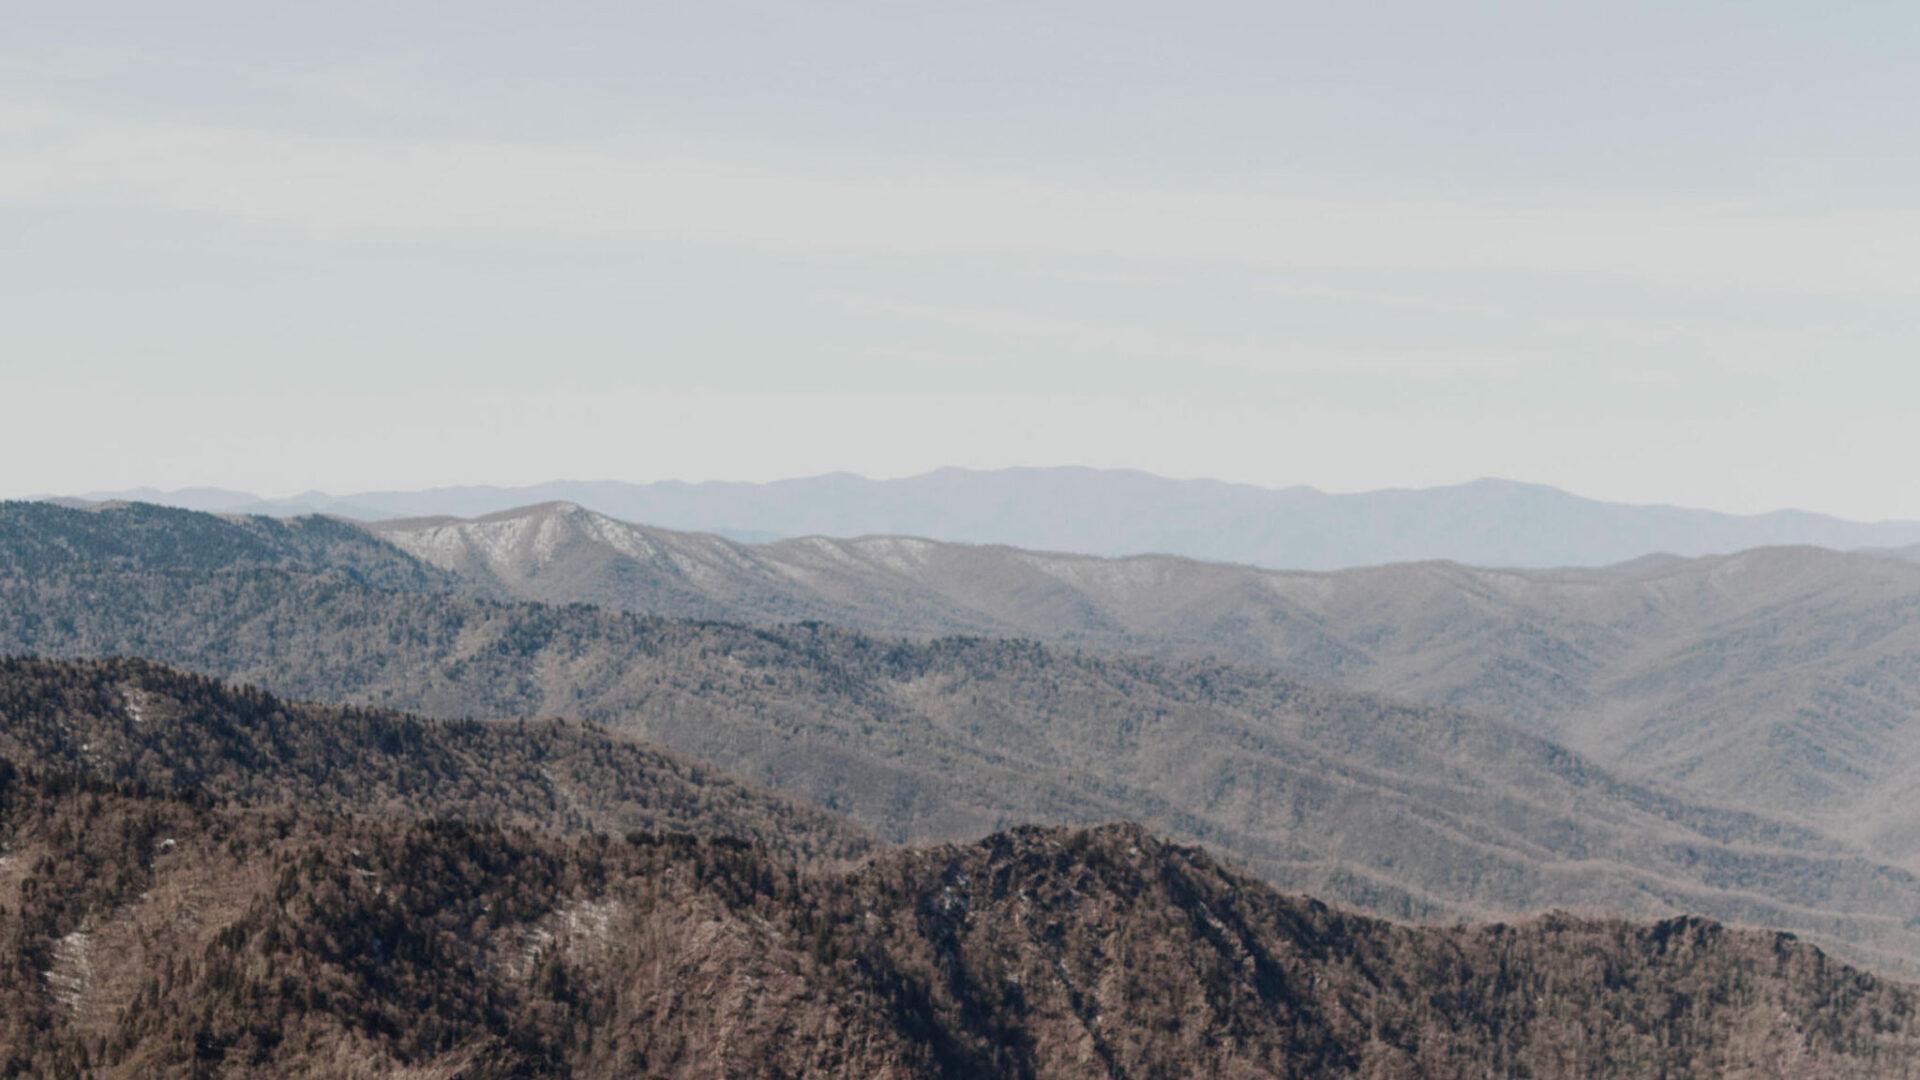 Brown and gray mountain range